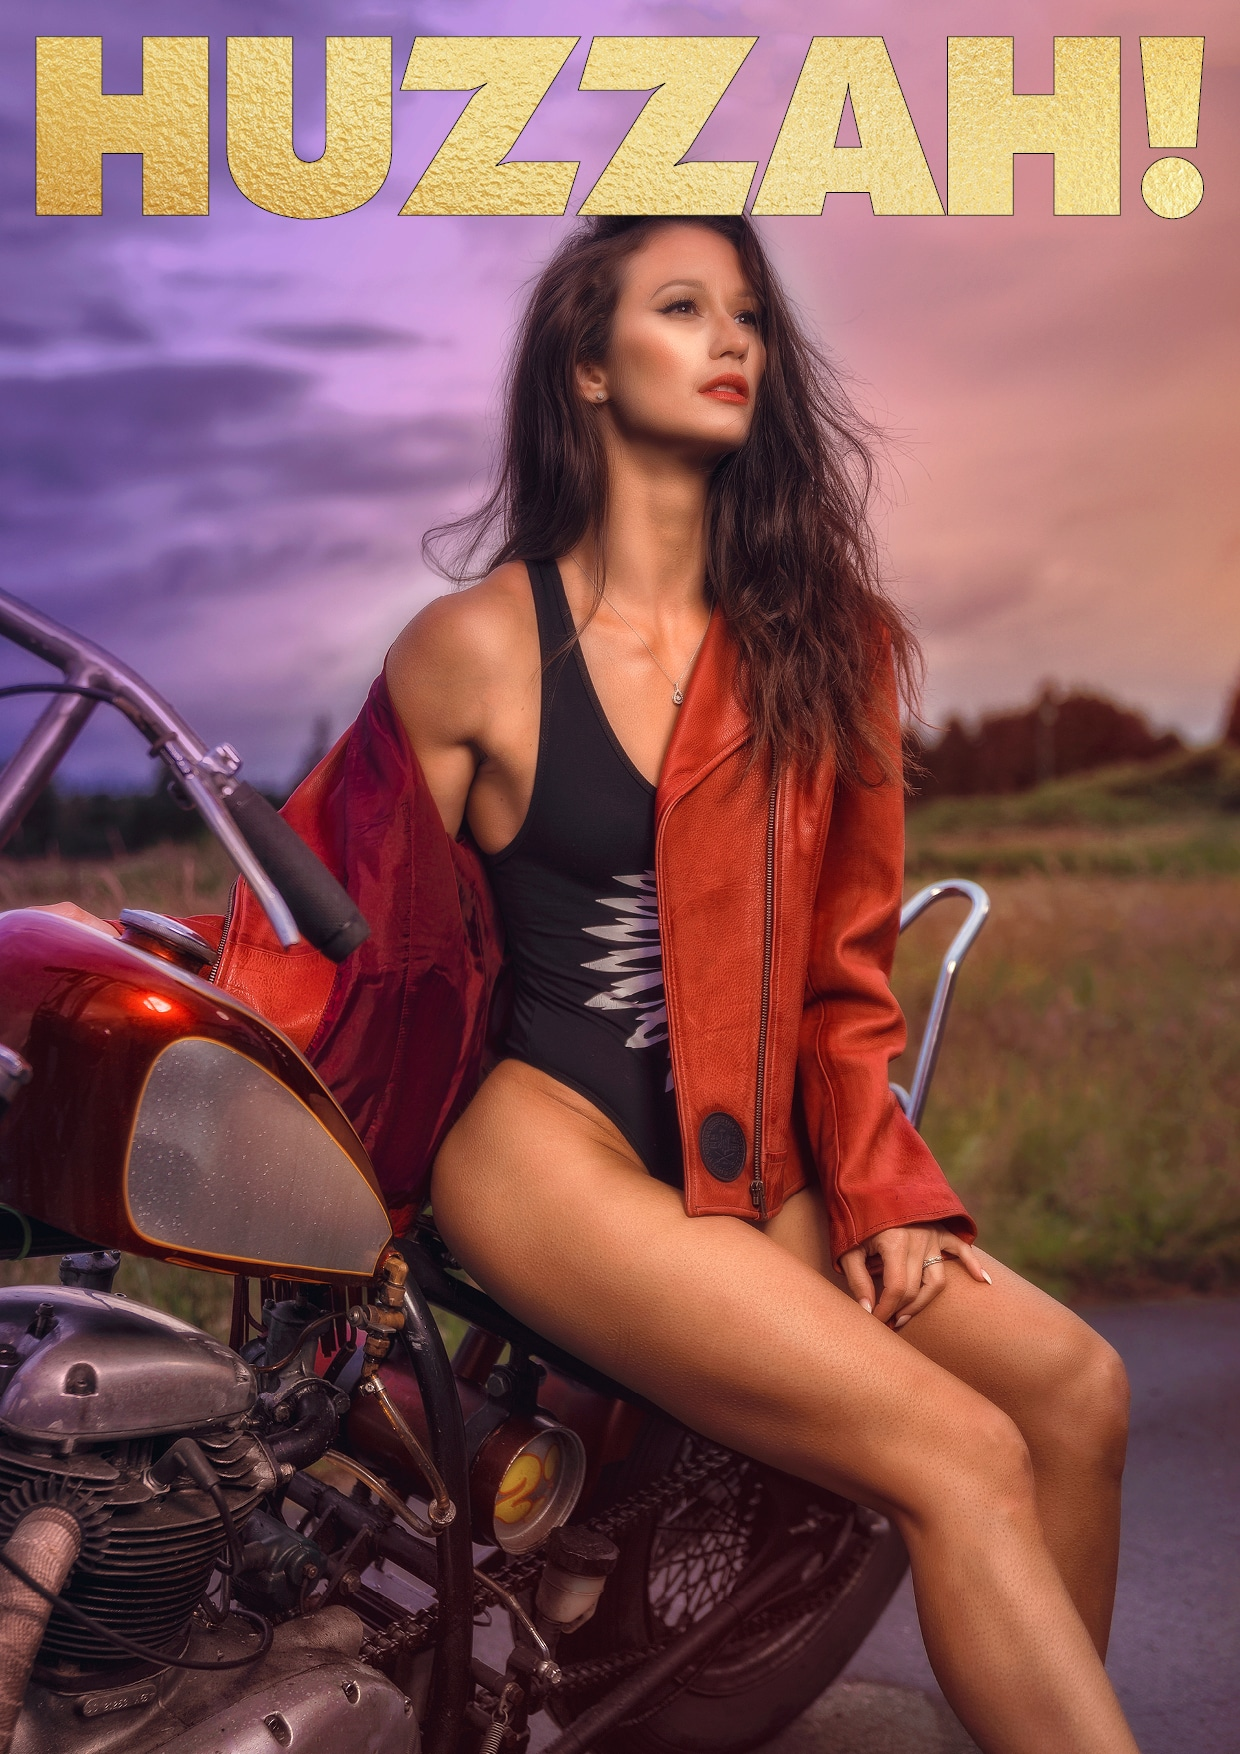 HUZZAH! Magazine - September 2020 - Hannah Jo 2